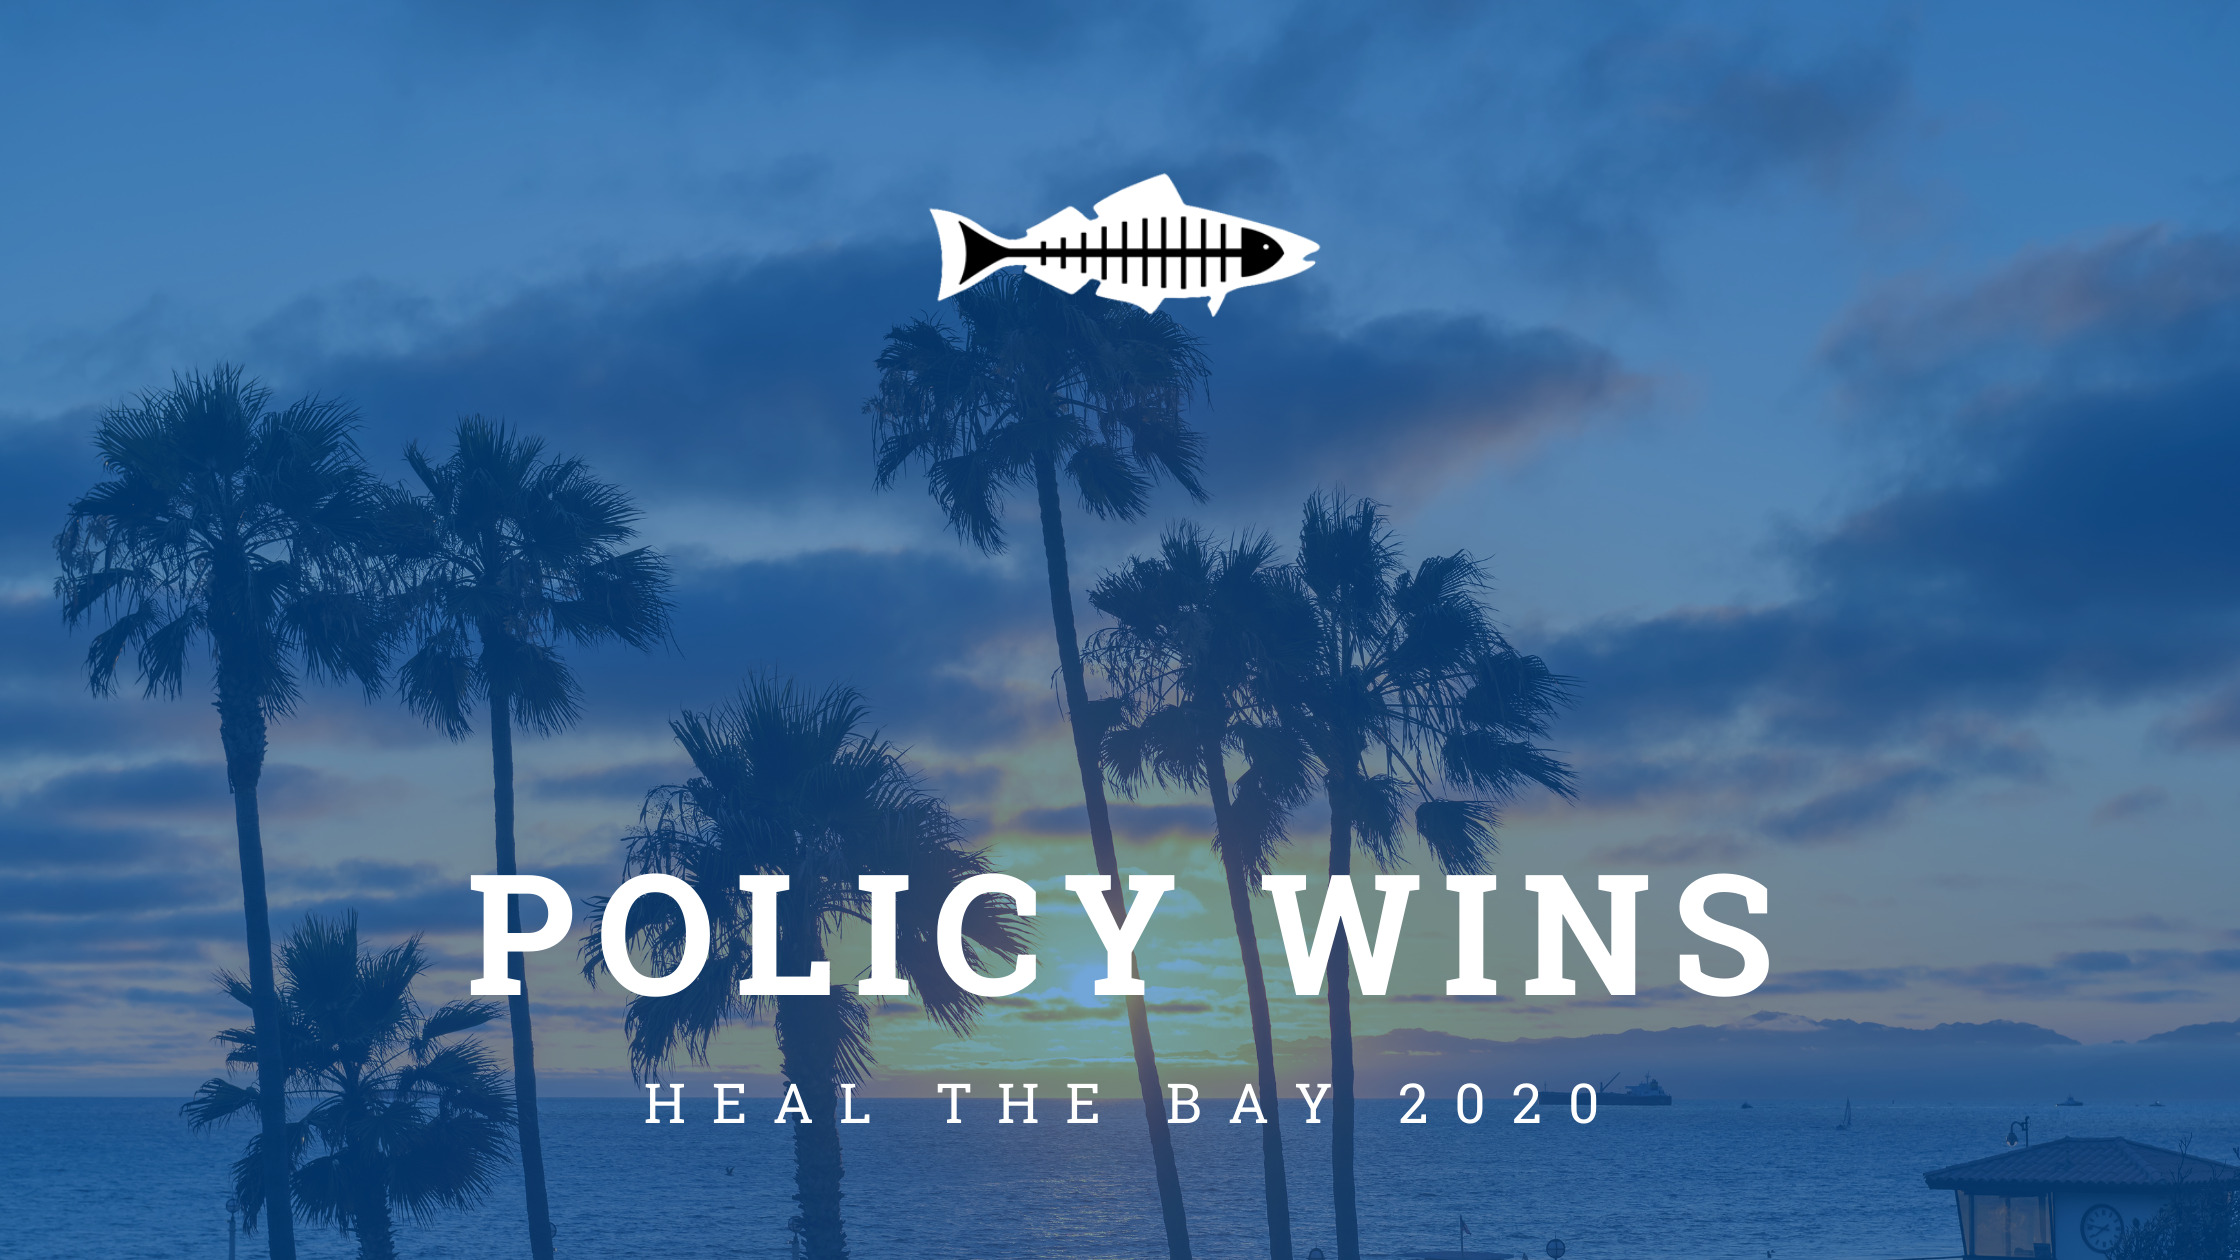 heal the bay environmental policy wins 2020